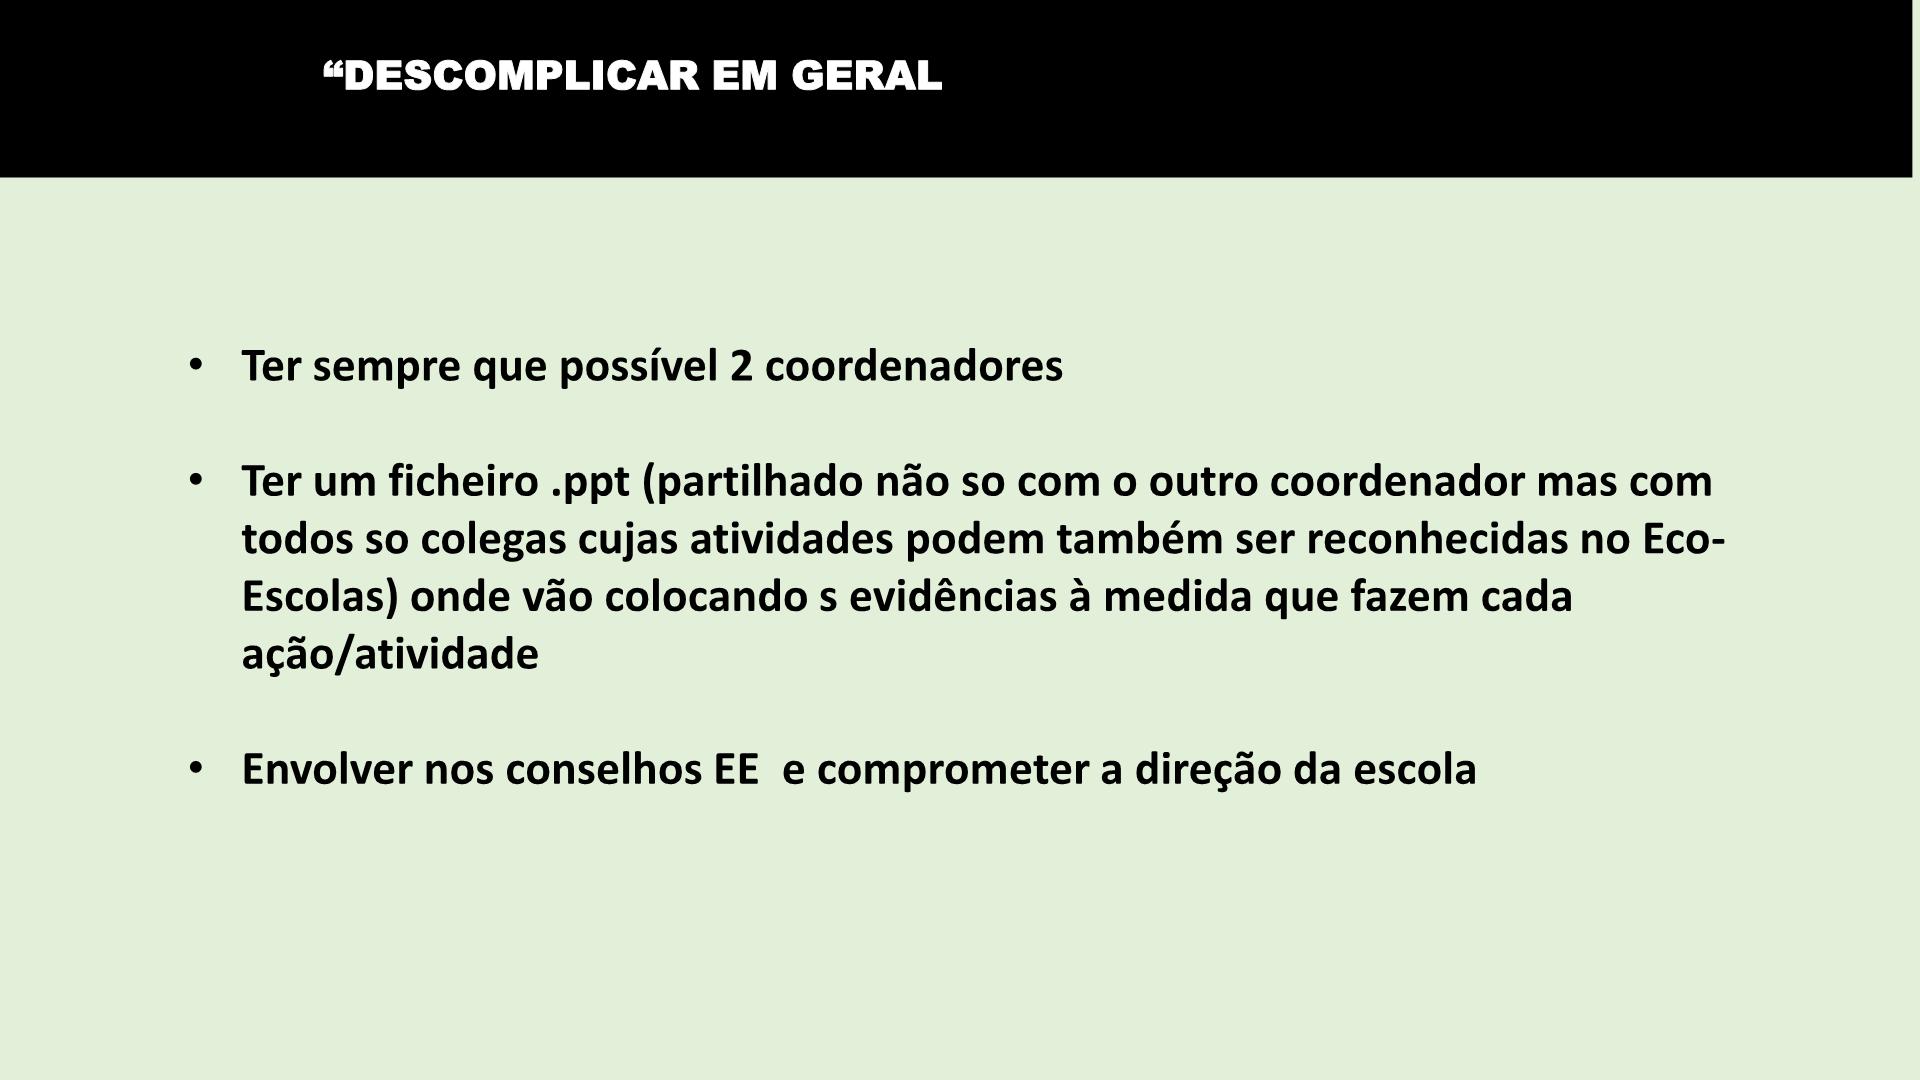 DESCOMPLICAR28